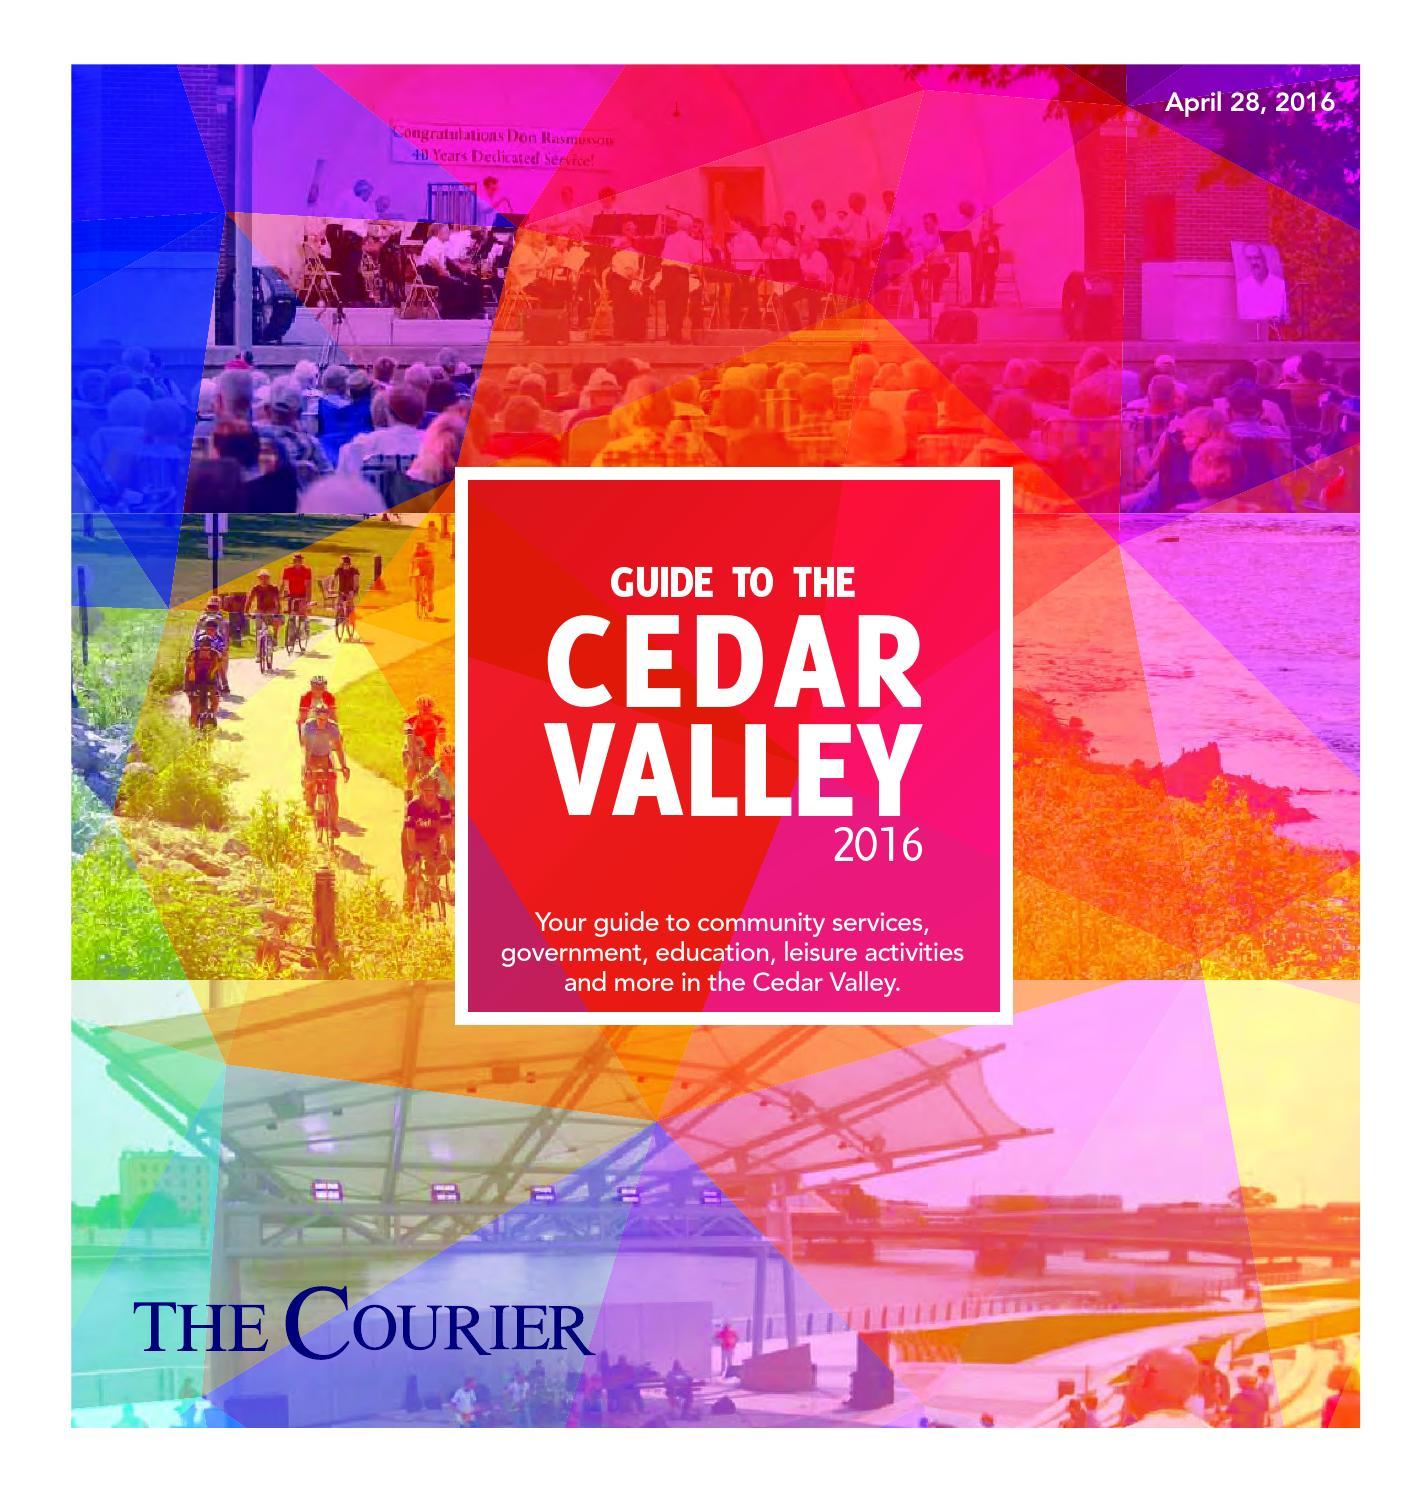 Guide to the cedar valley 2016 by waterloo cedar falls courier issuu fandeluxe Gallery